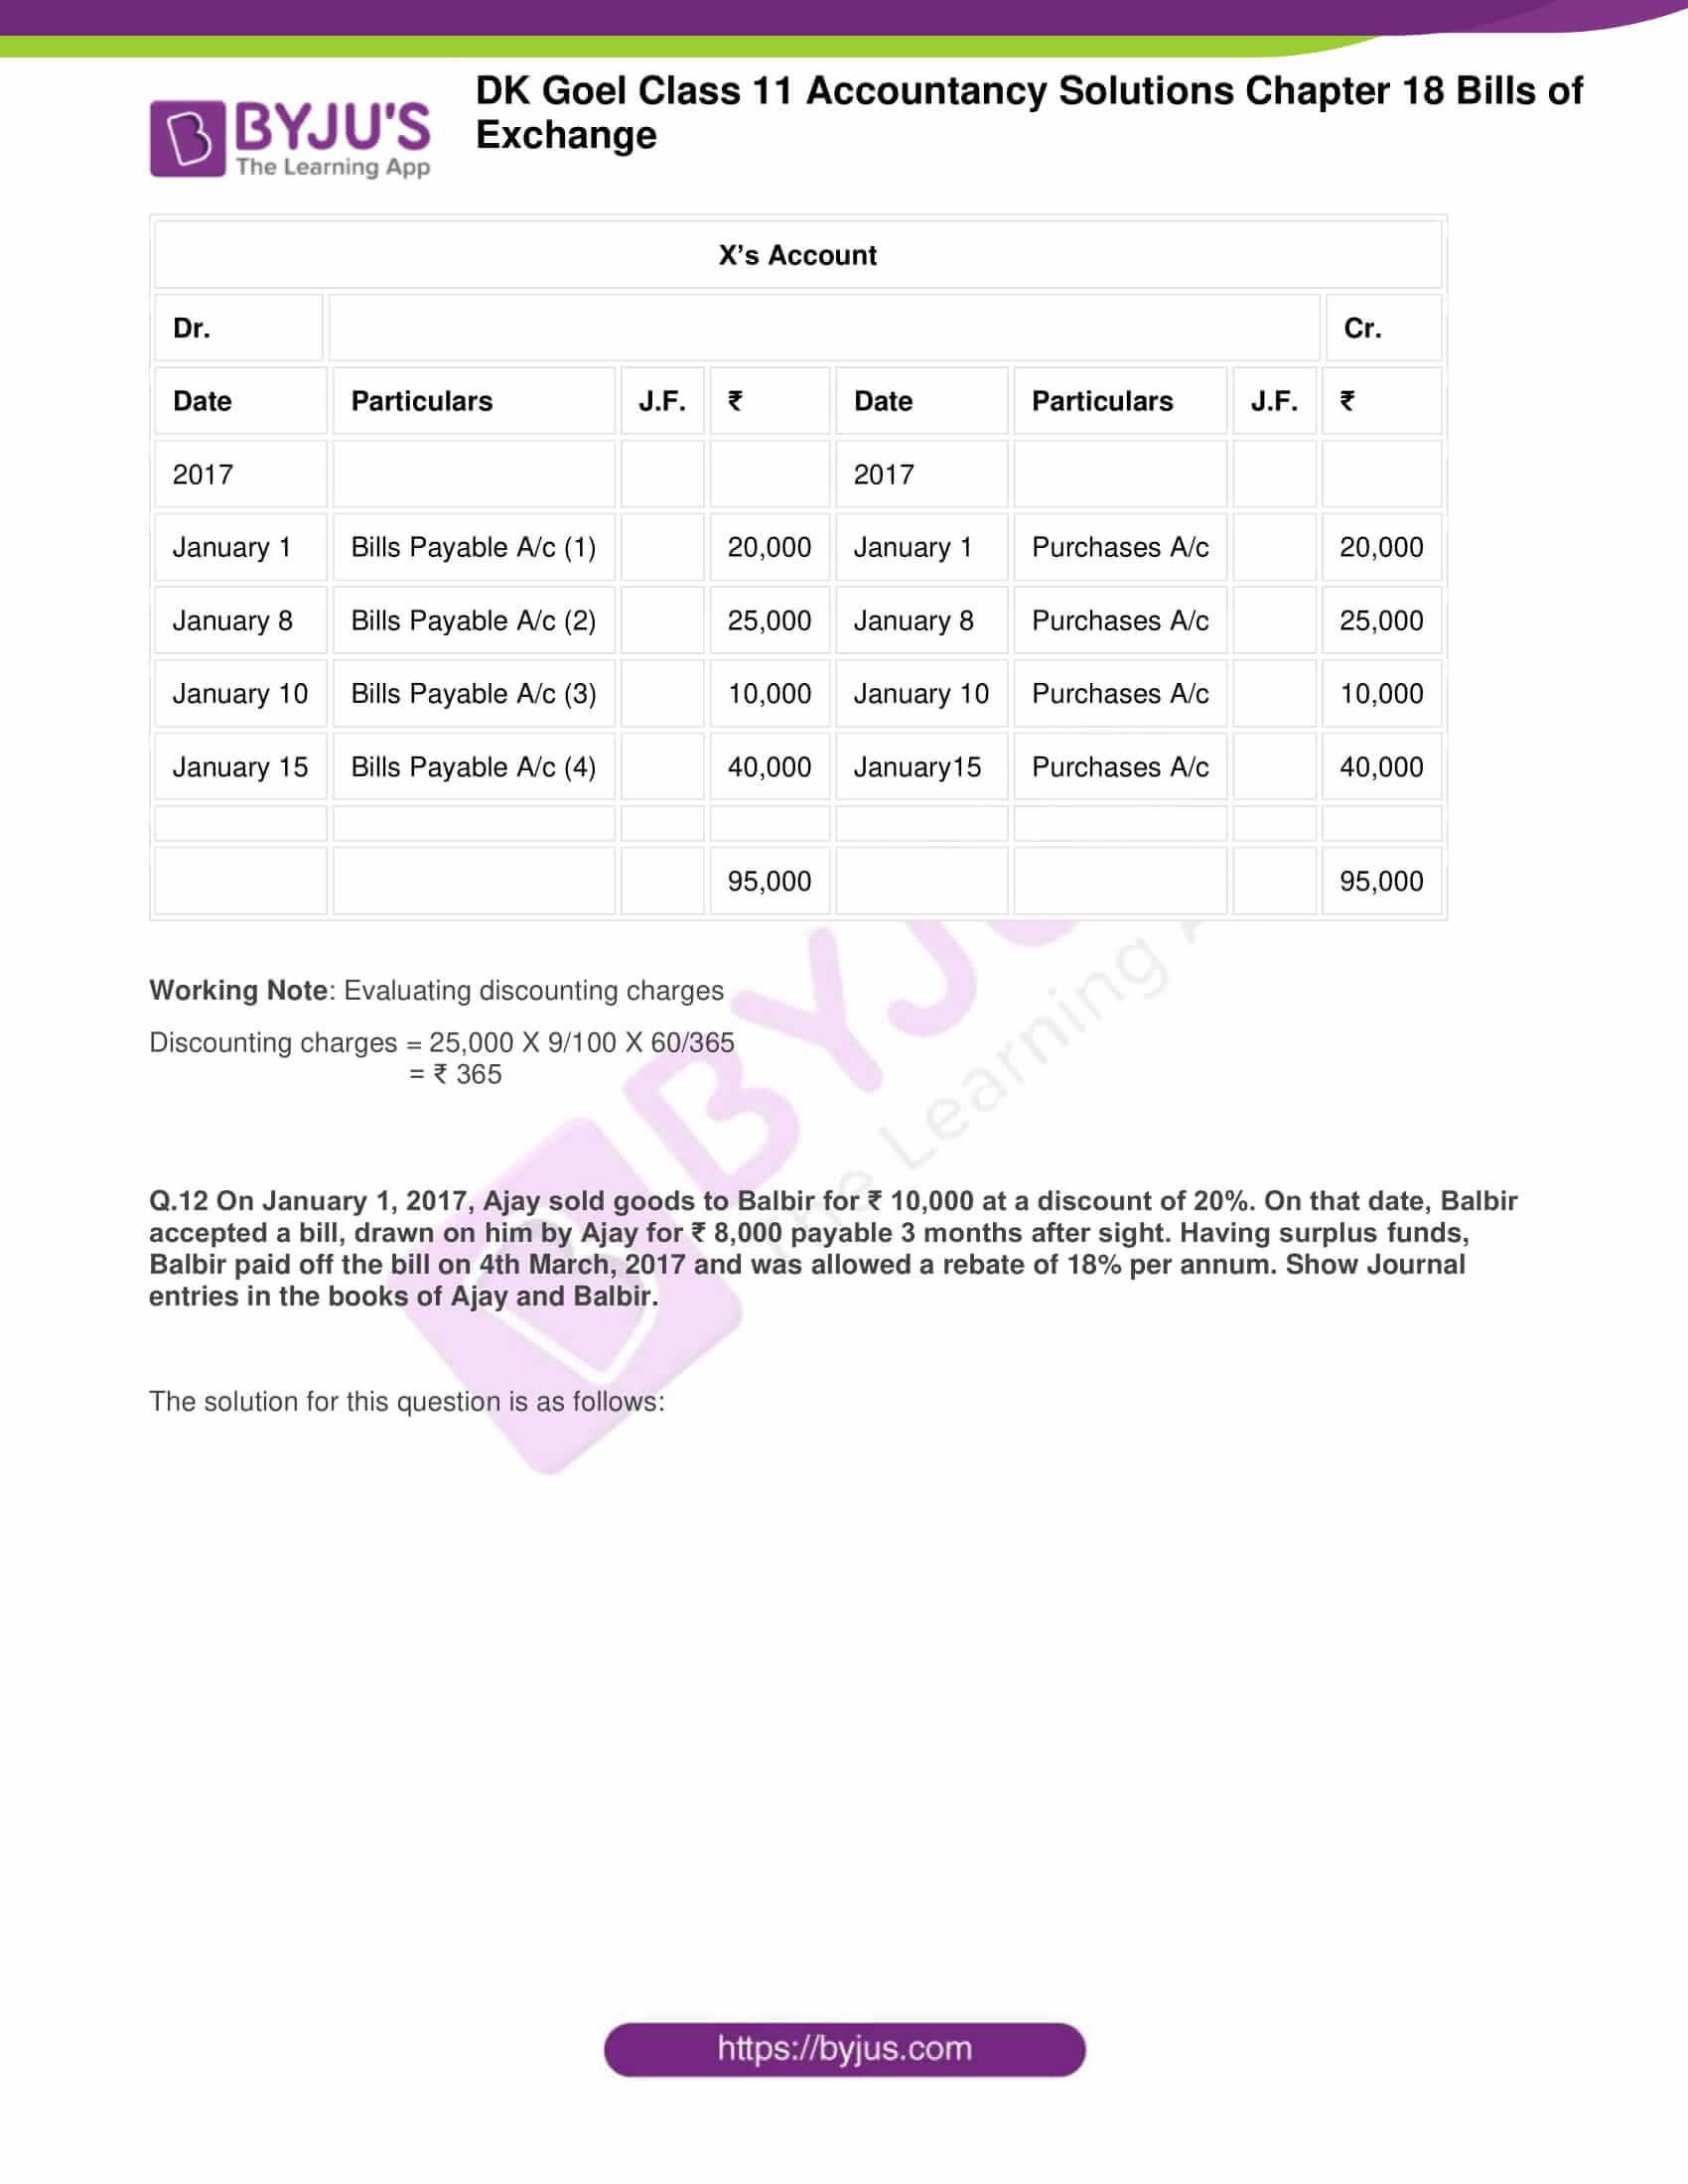 dk goel class 11 accountancy solutions chapter 18 024